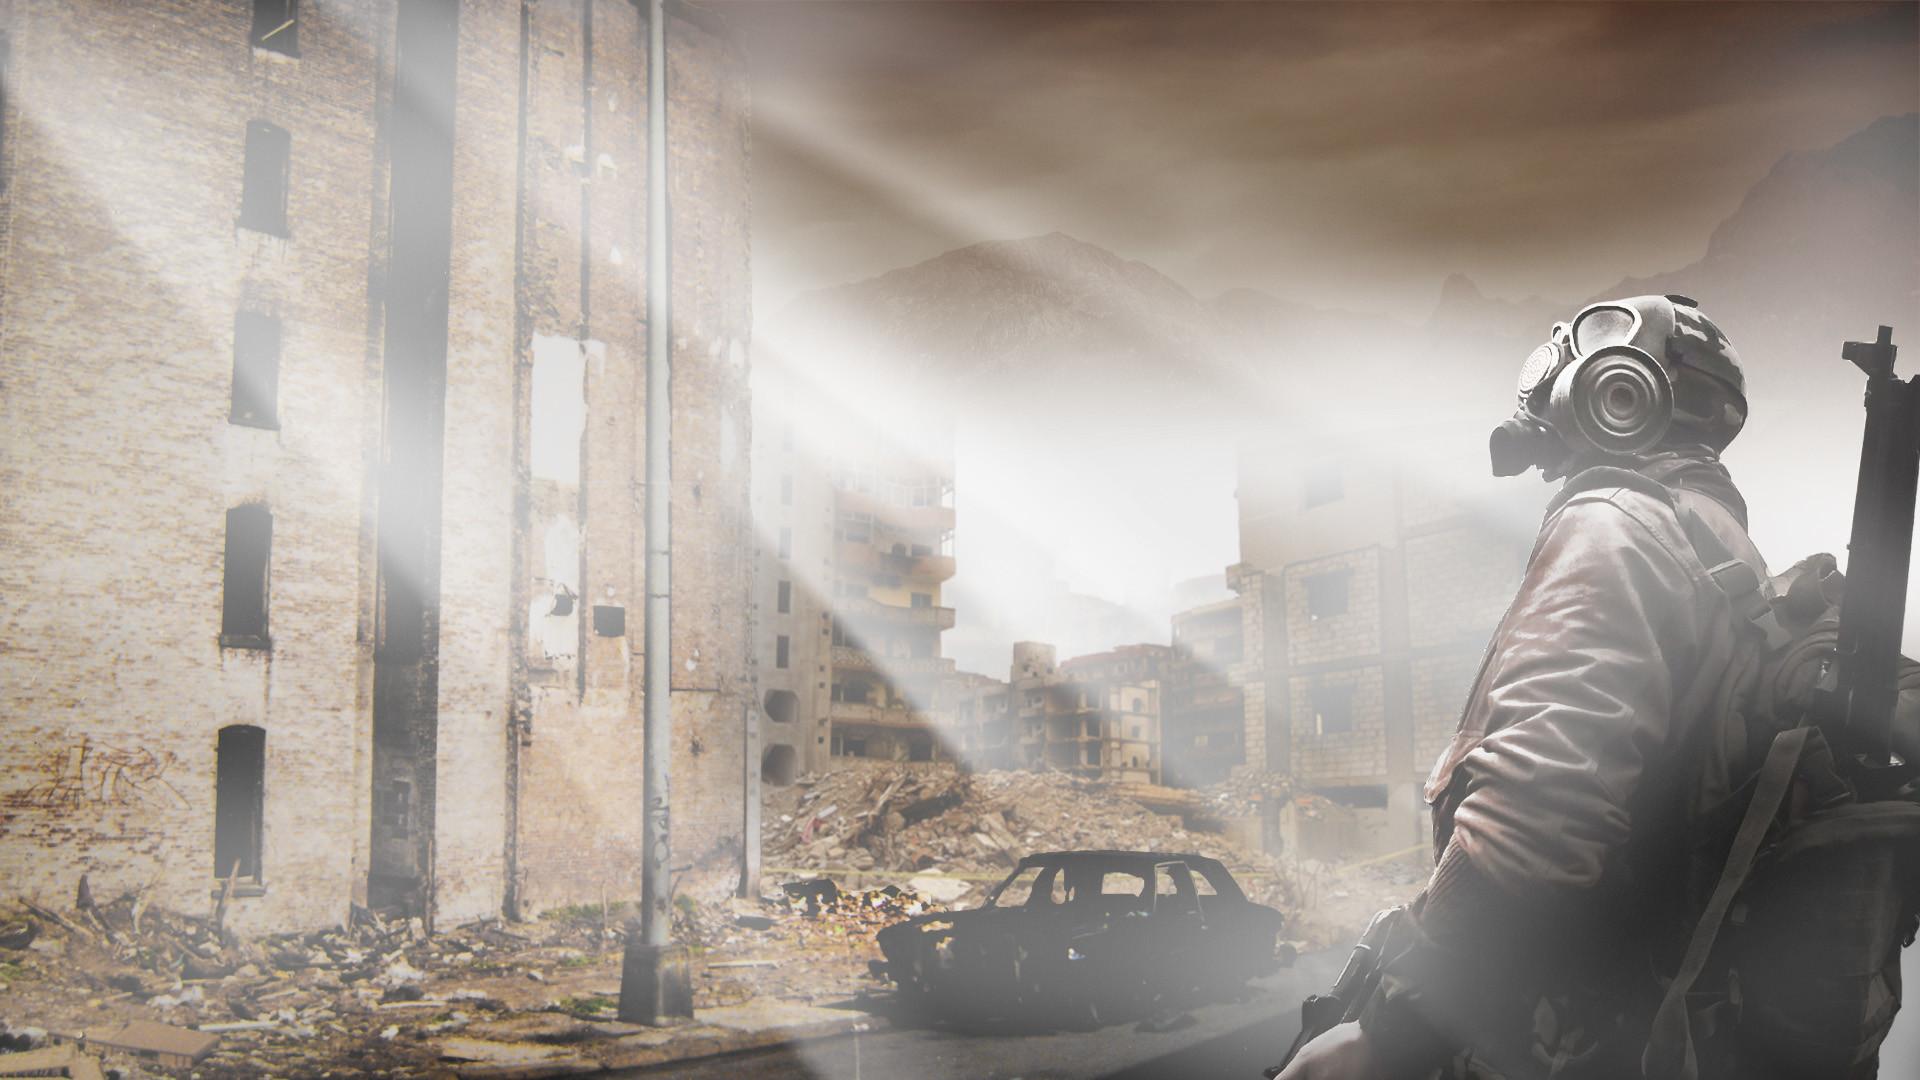 Sci Fi – Post Apocalyptic Apocalypse Gas Mask Mask Wallpaper